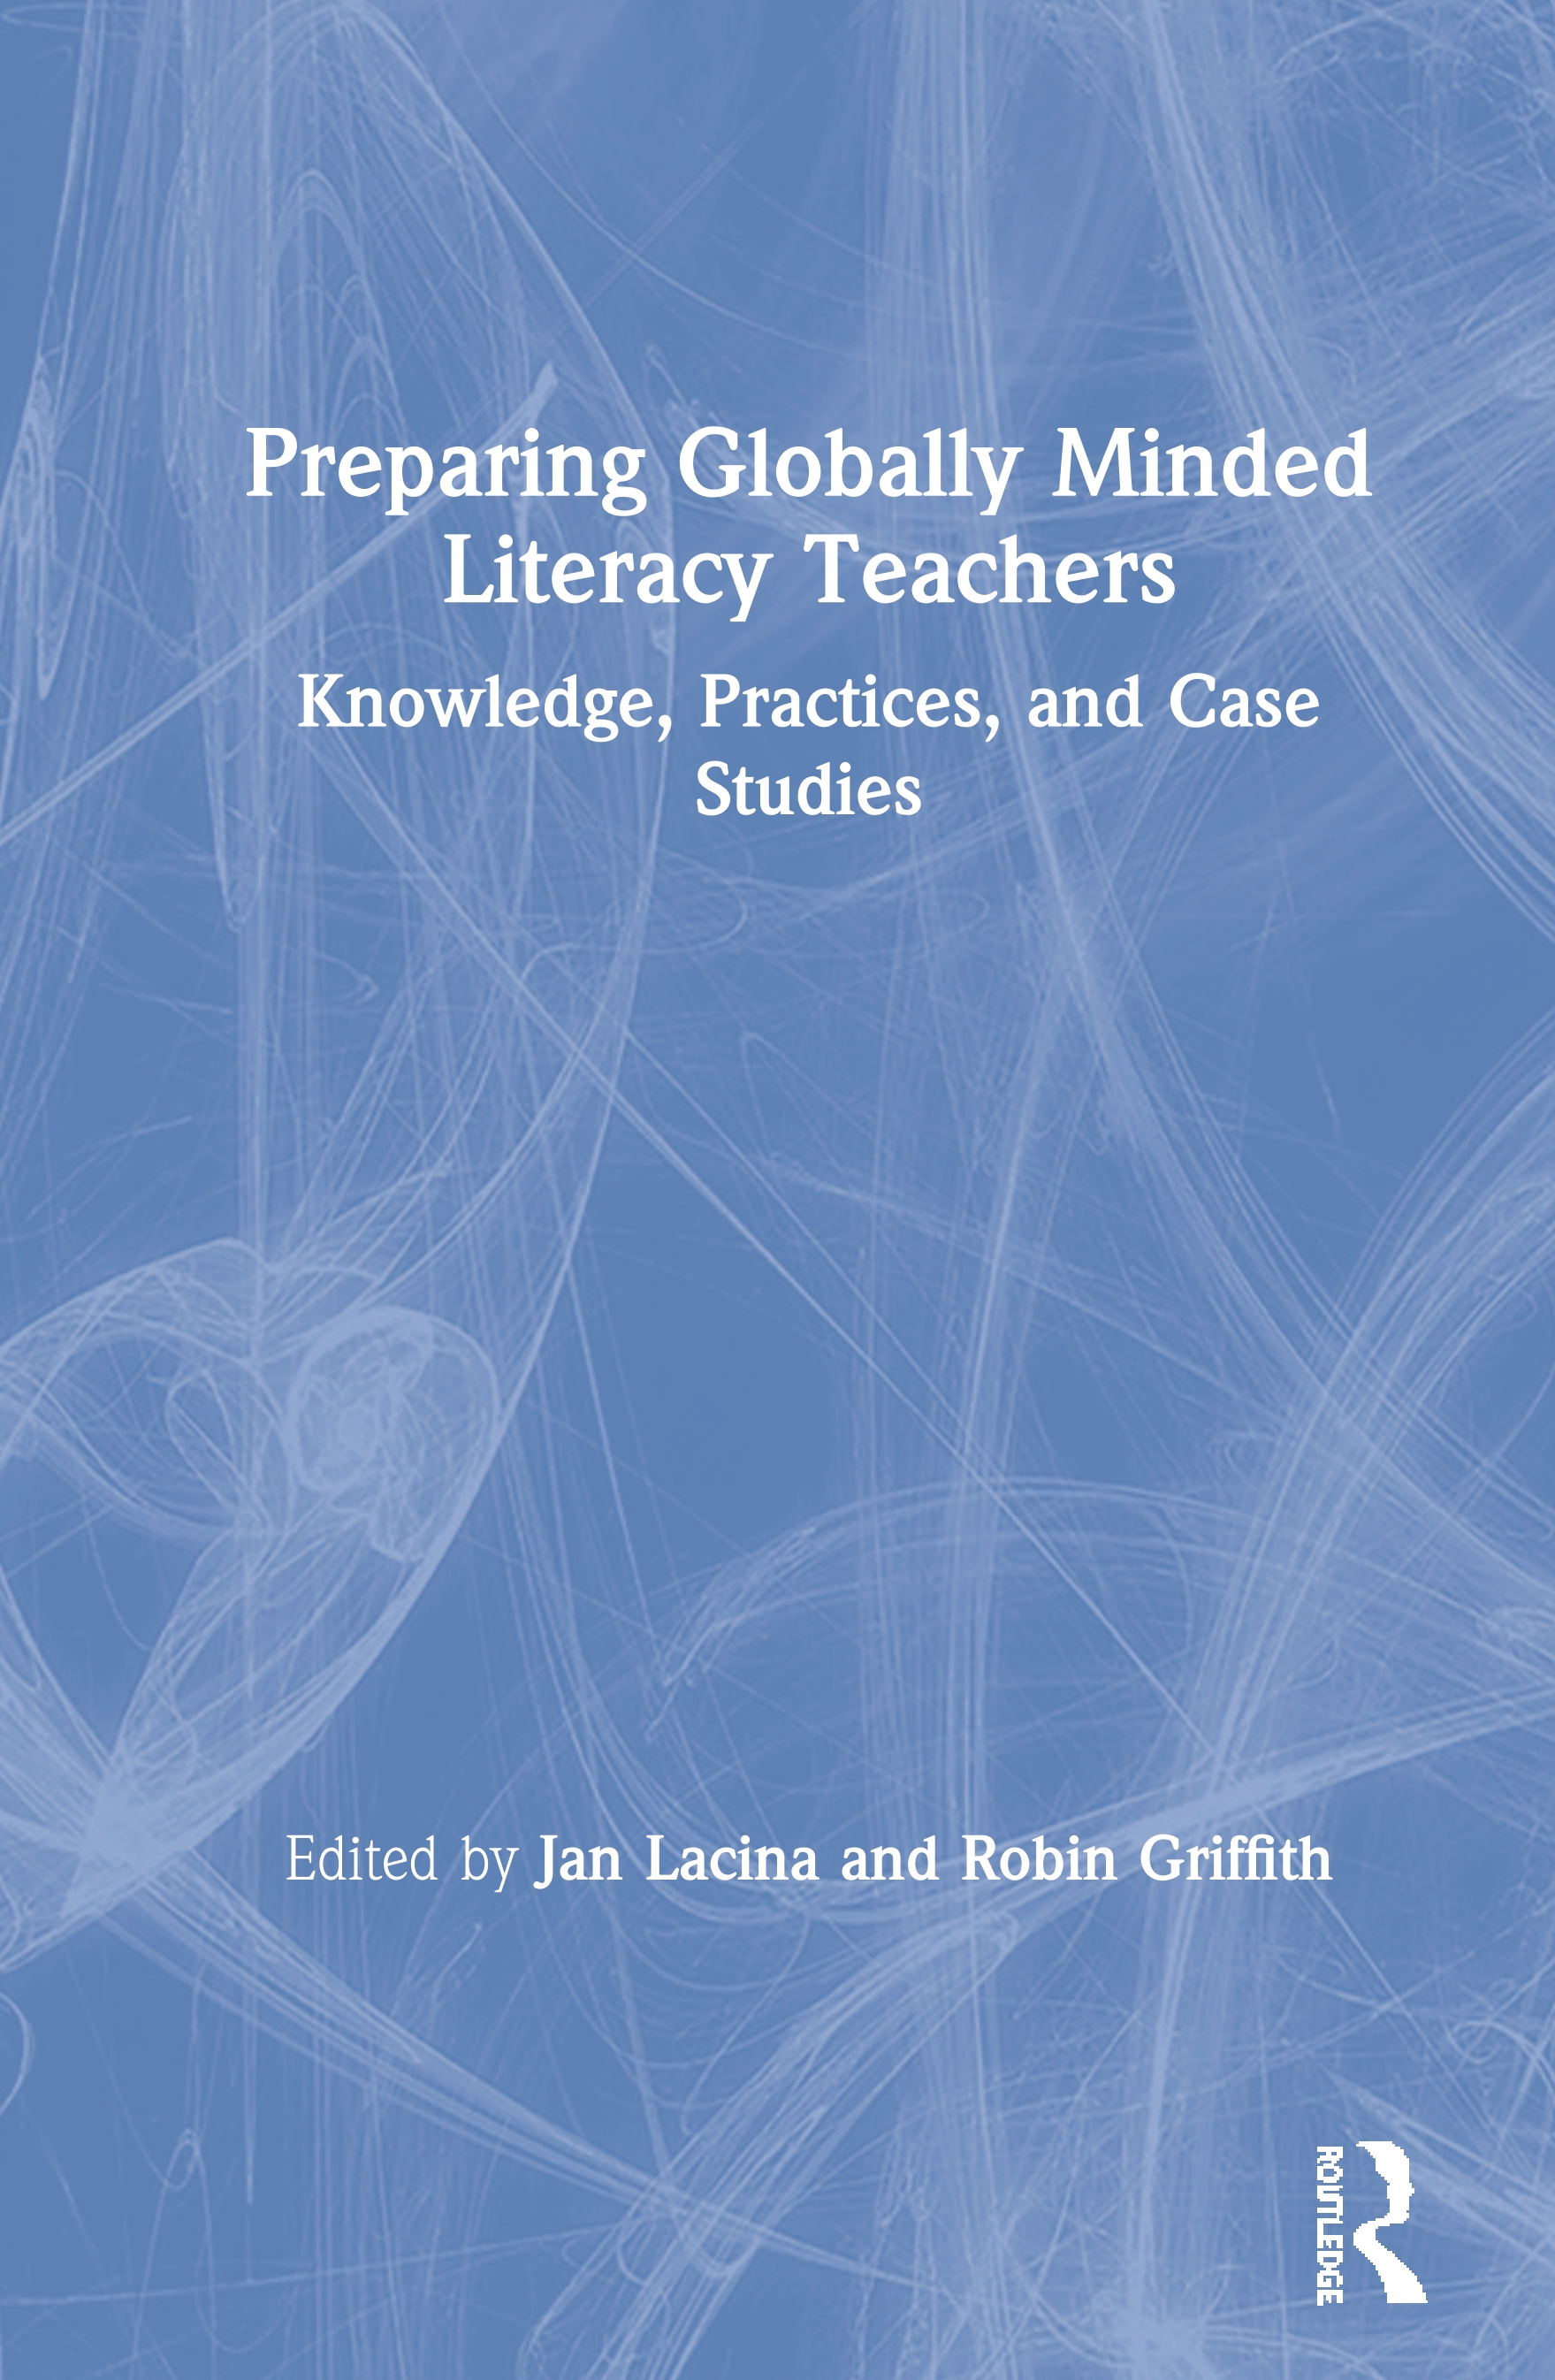 Preparing Globally Minded Literacy Teachers